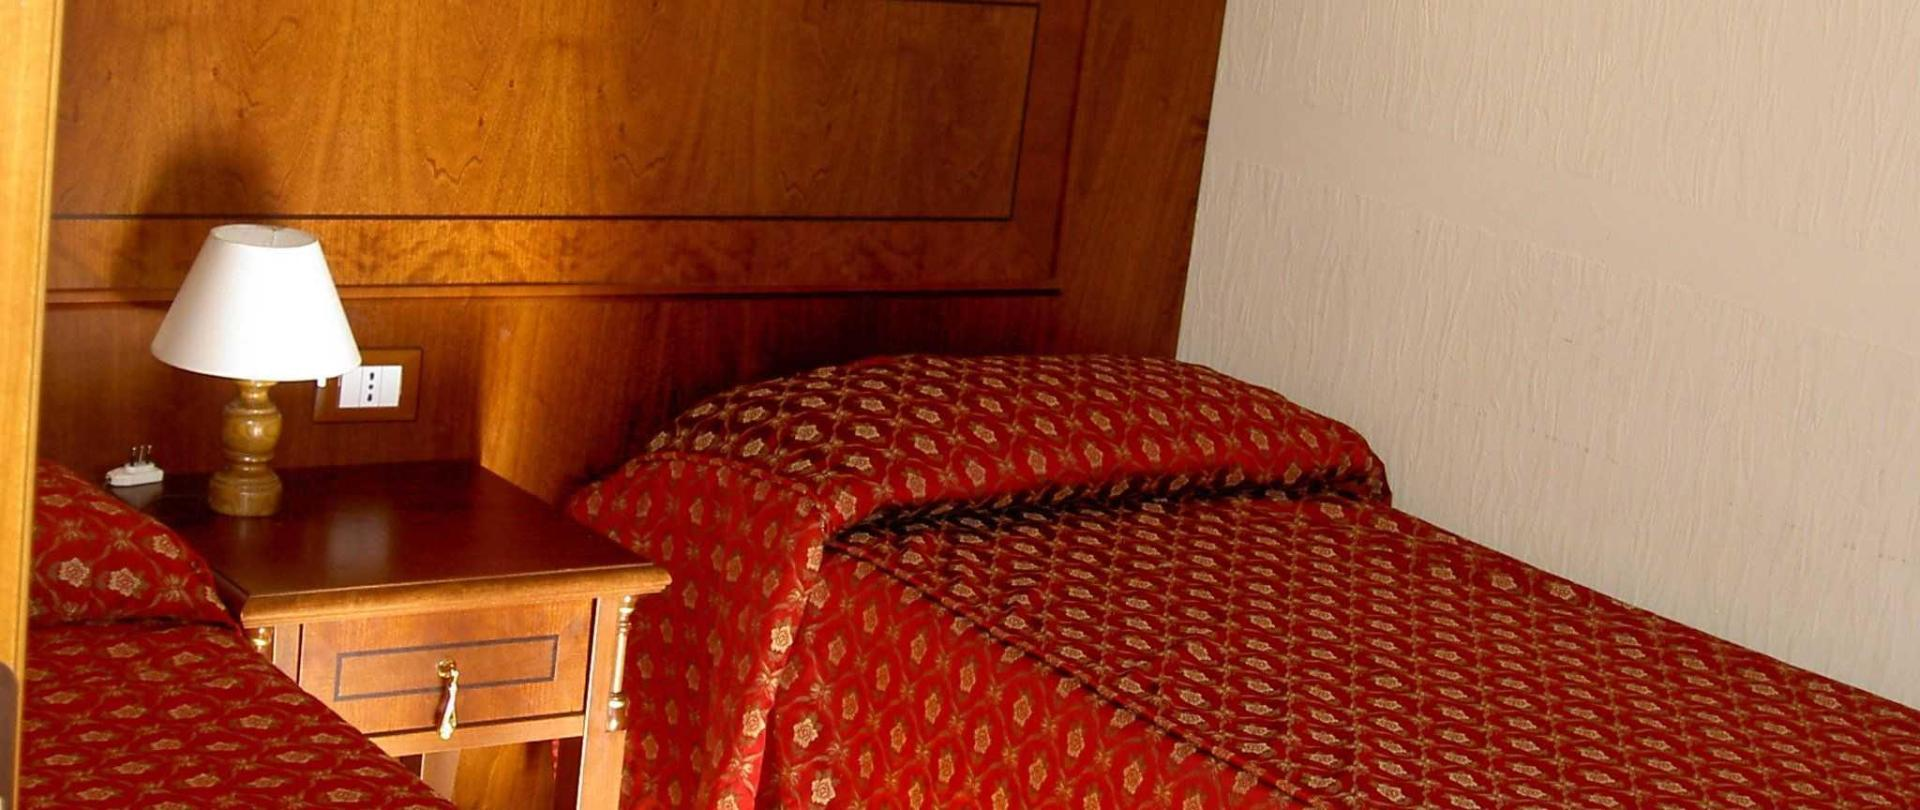 room-002-1.JPG